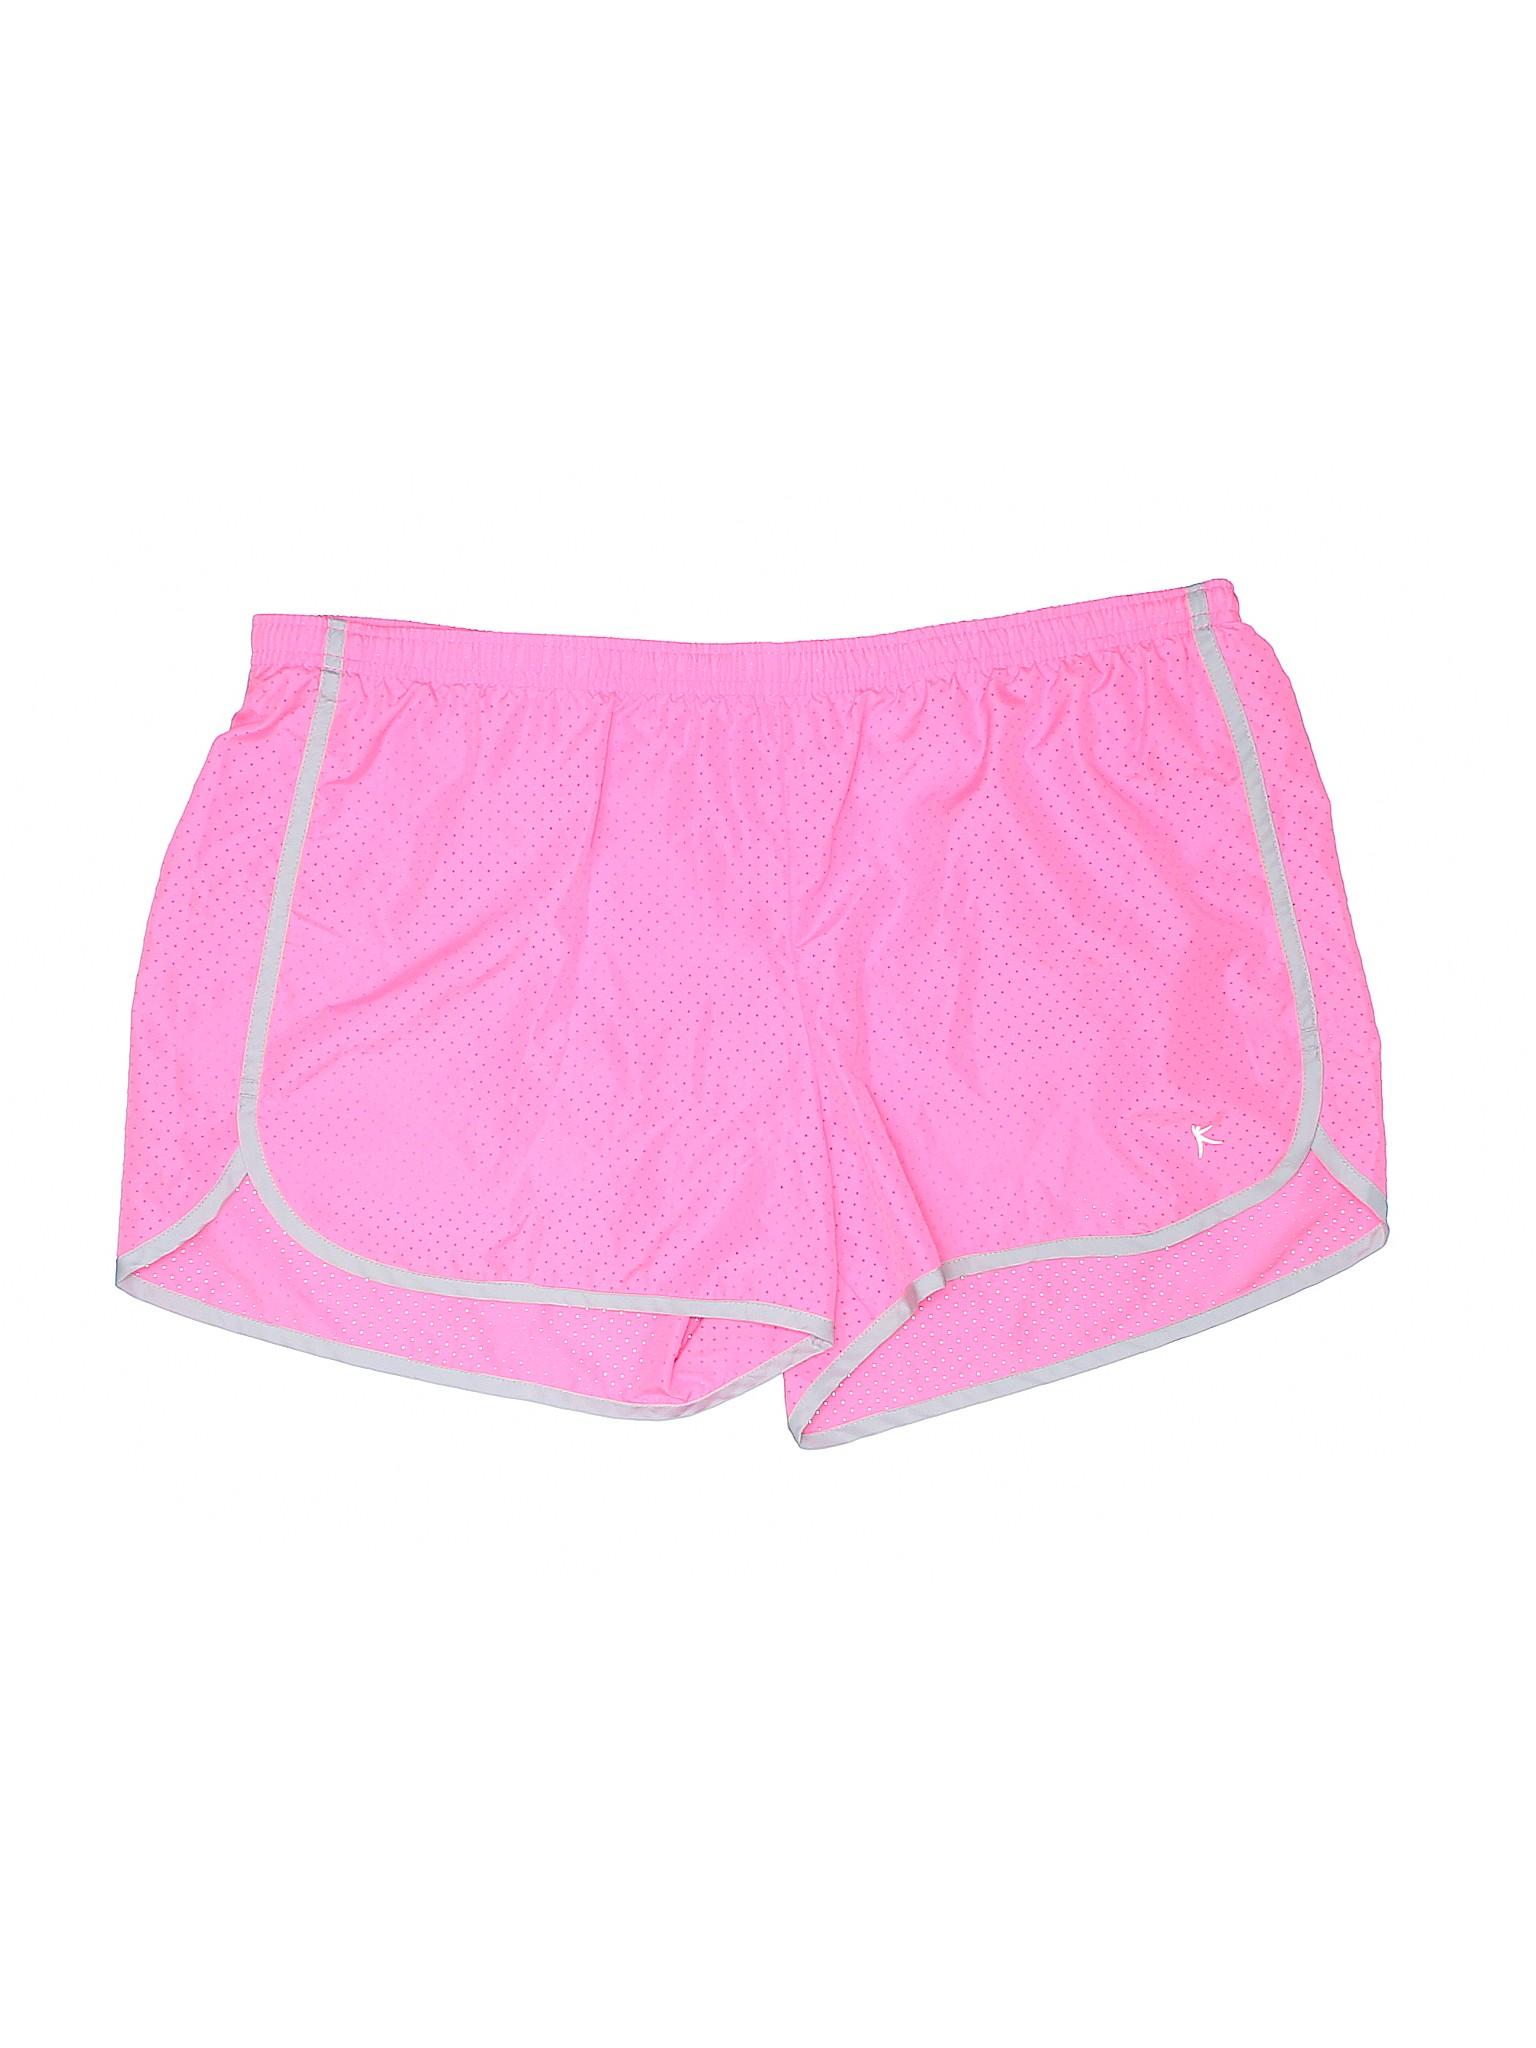 Athletic Boutique Now Shorts Danskin Danskin Boutique vYcBwRO